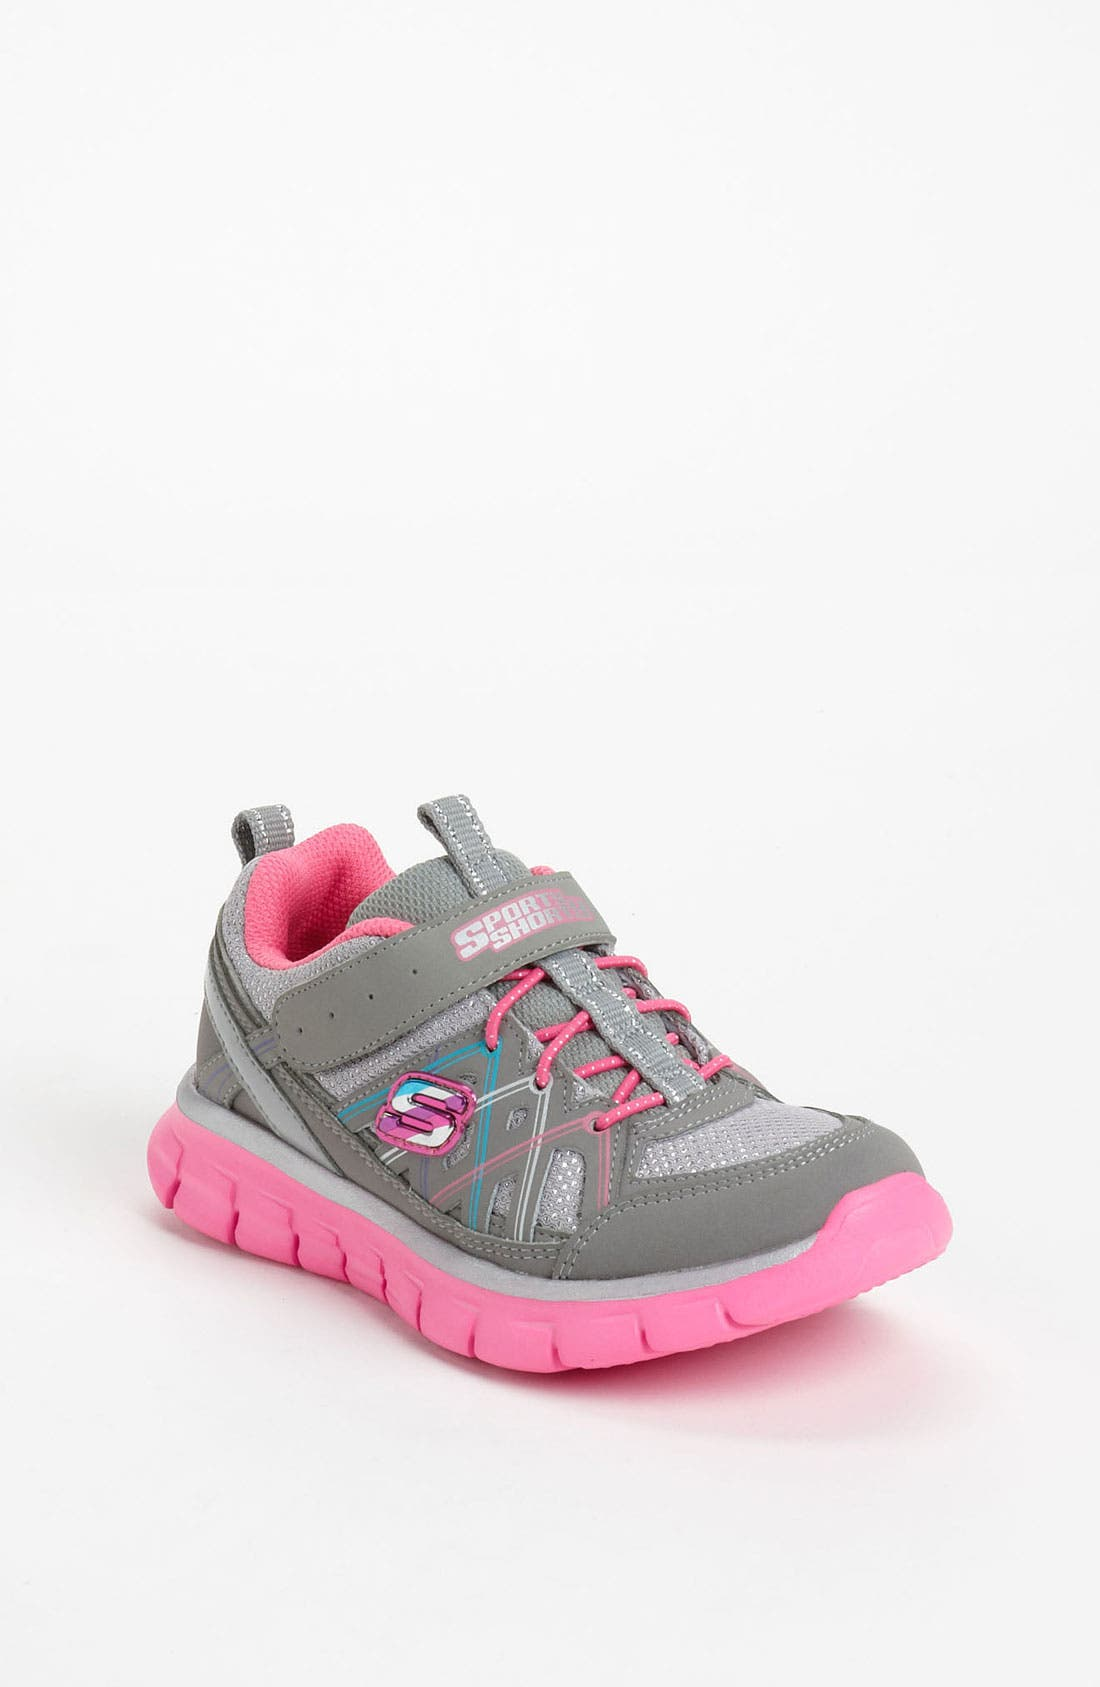 Alternate Image 1 Selected - SKECHERS 'Synergy Aerials' Sneaker (Toddler, Little Kid & Big Kid)